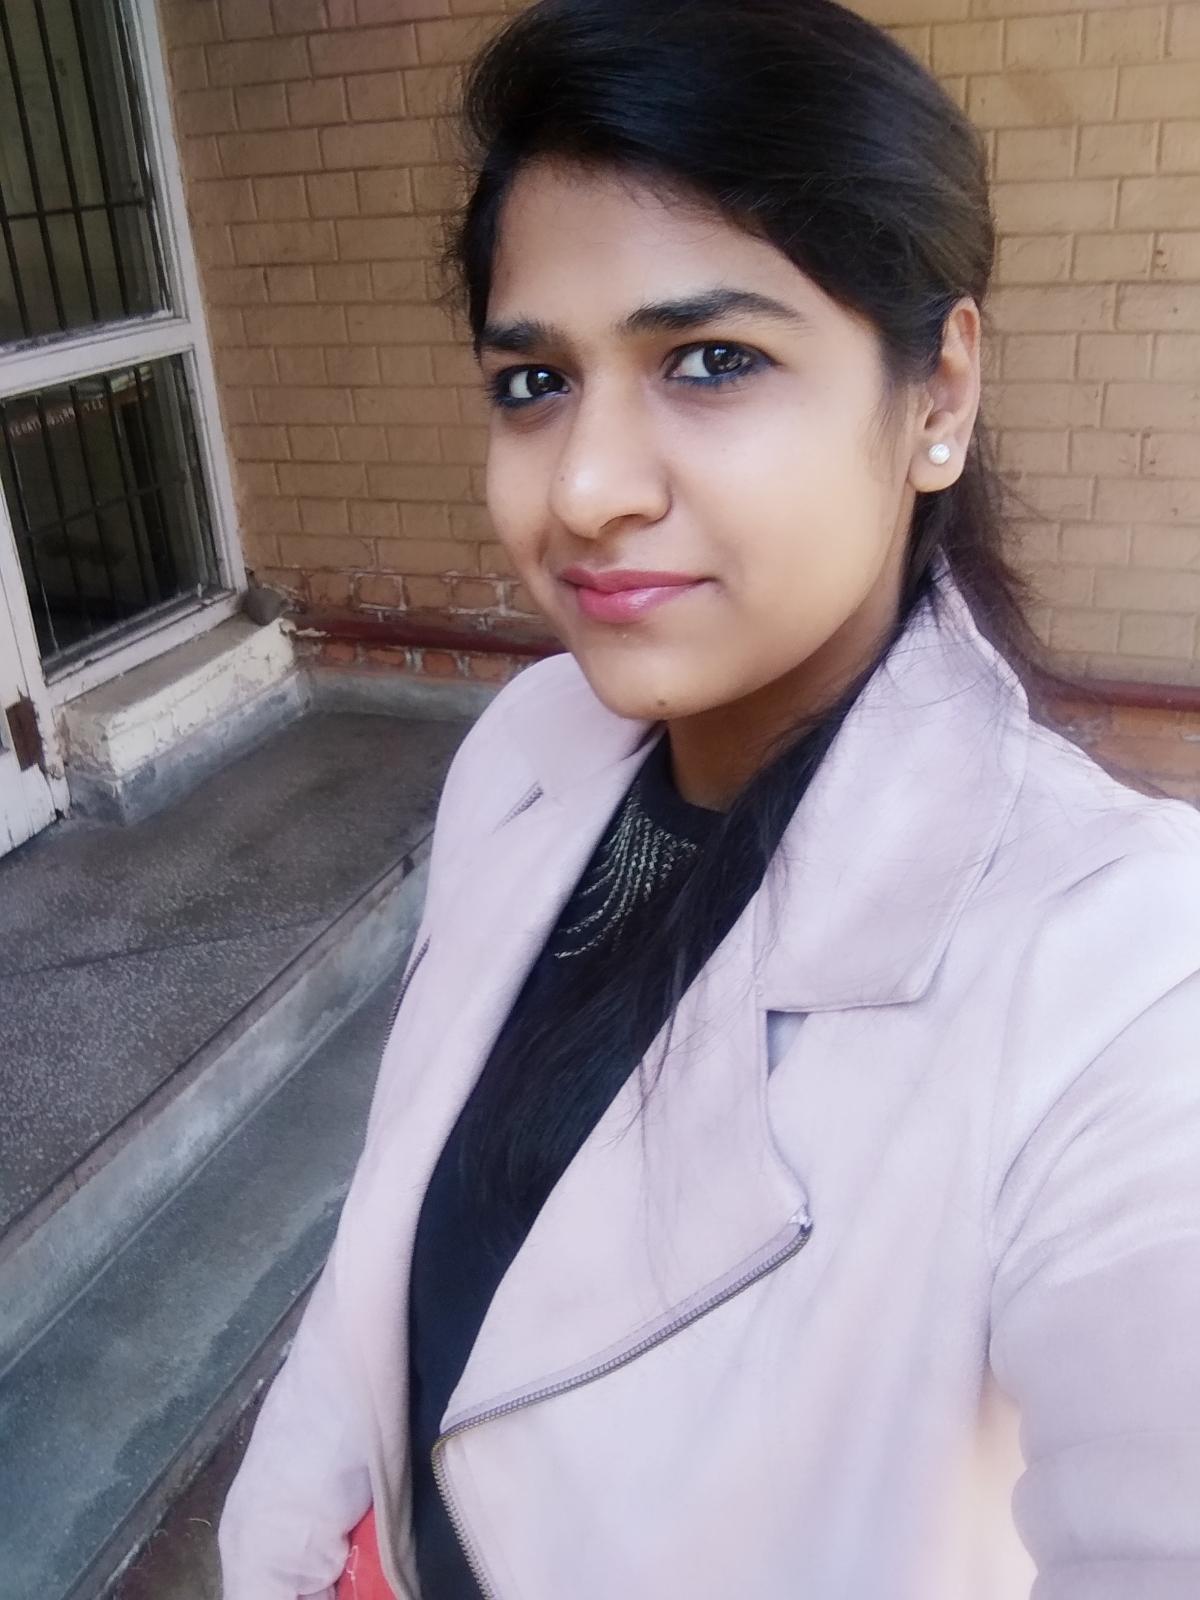 Ms. Anita Yadav